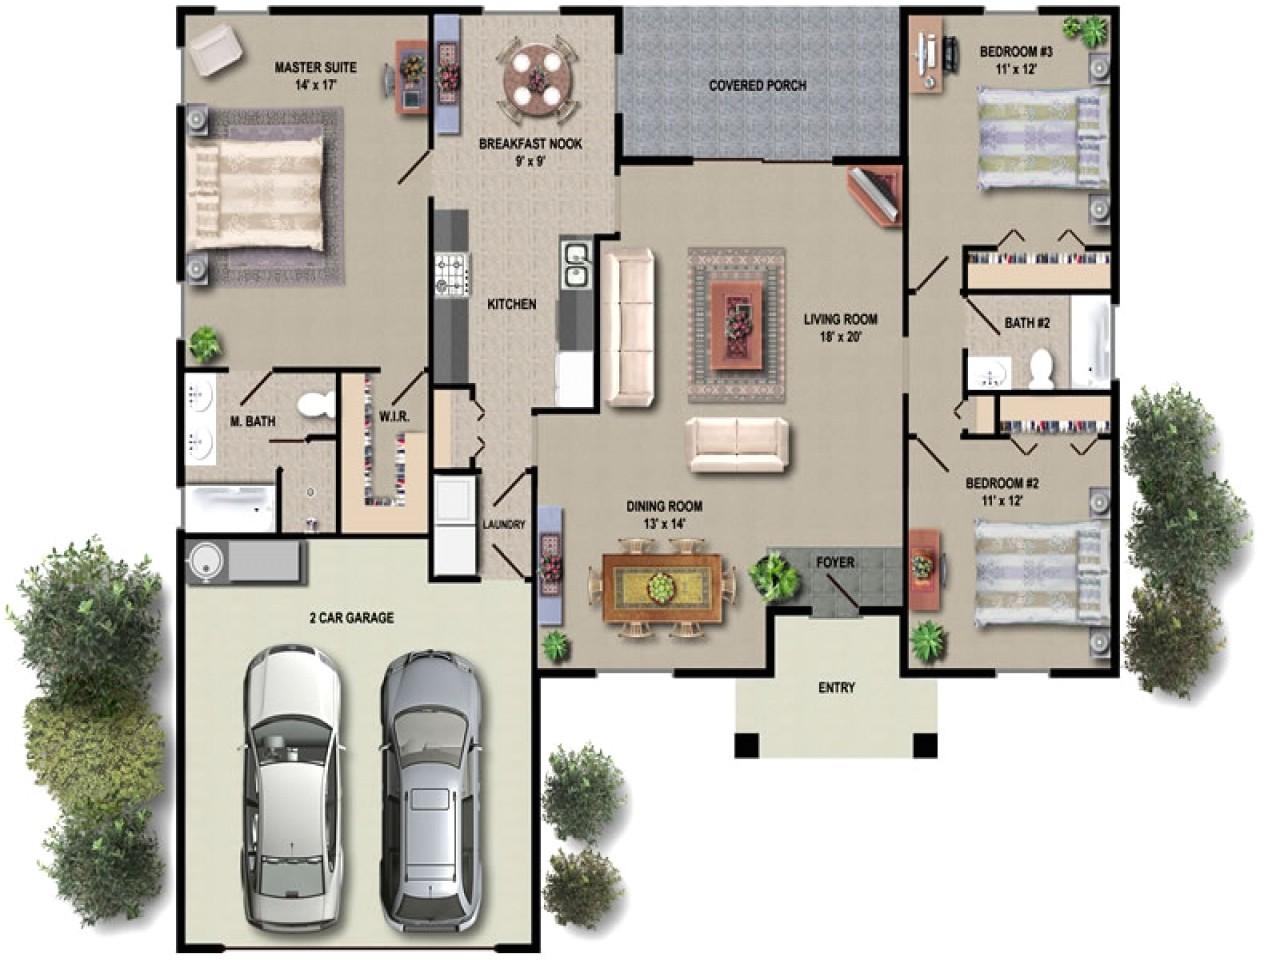 768468e2a155bd29 house floor plan design simple floor plans open house